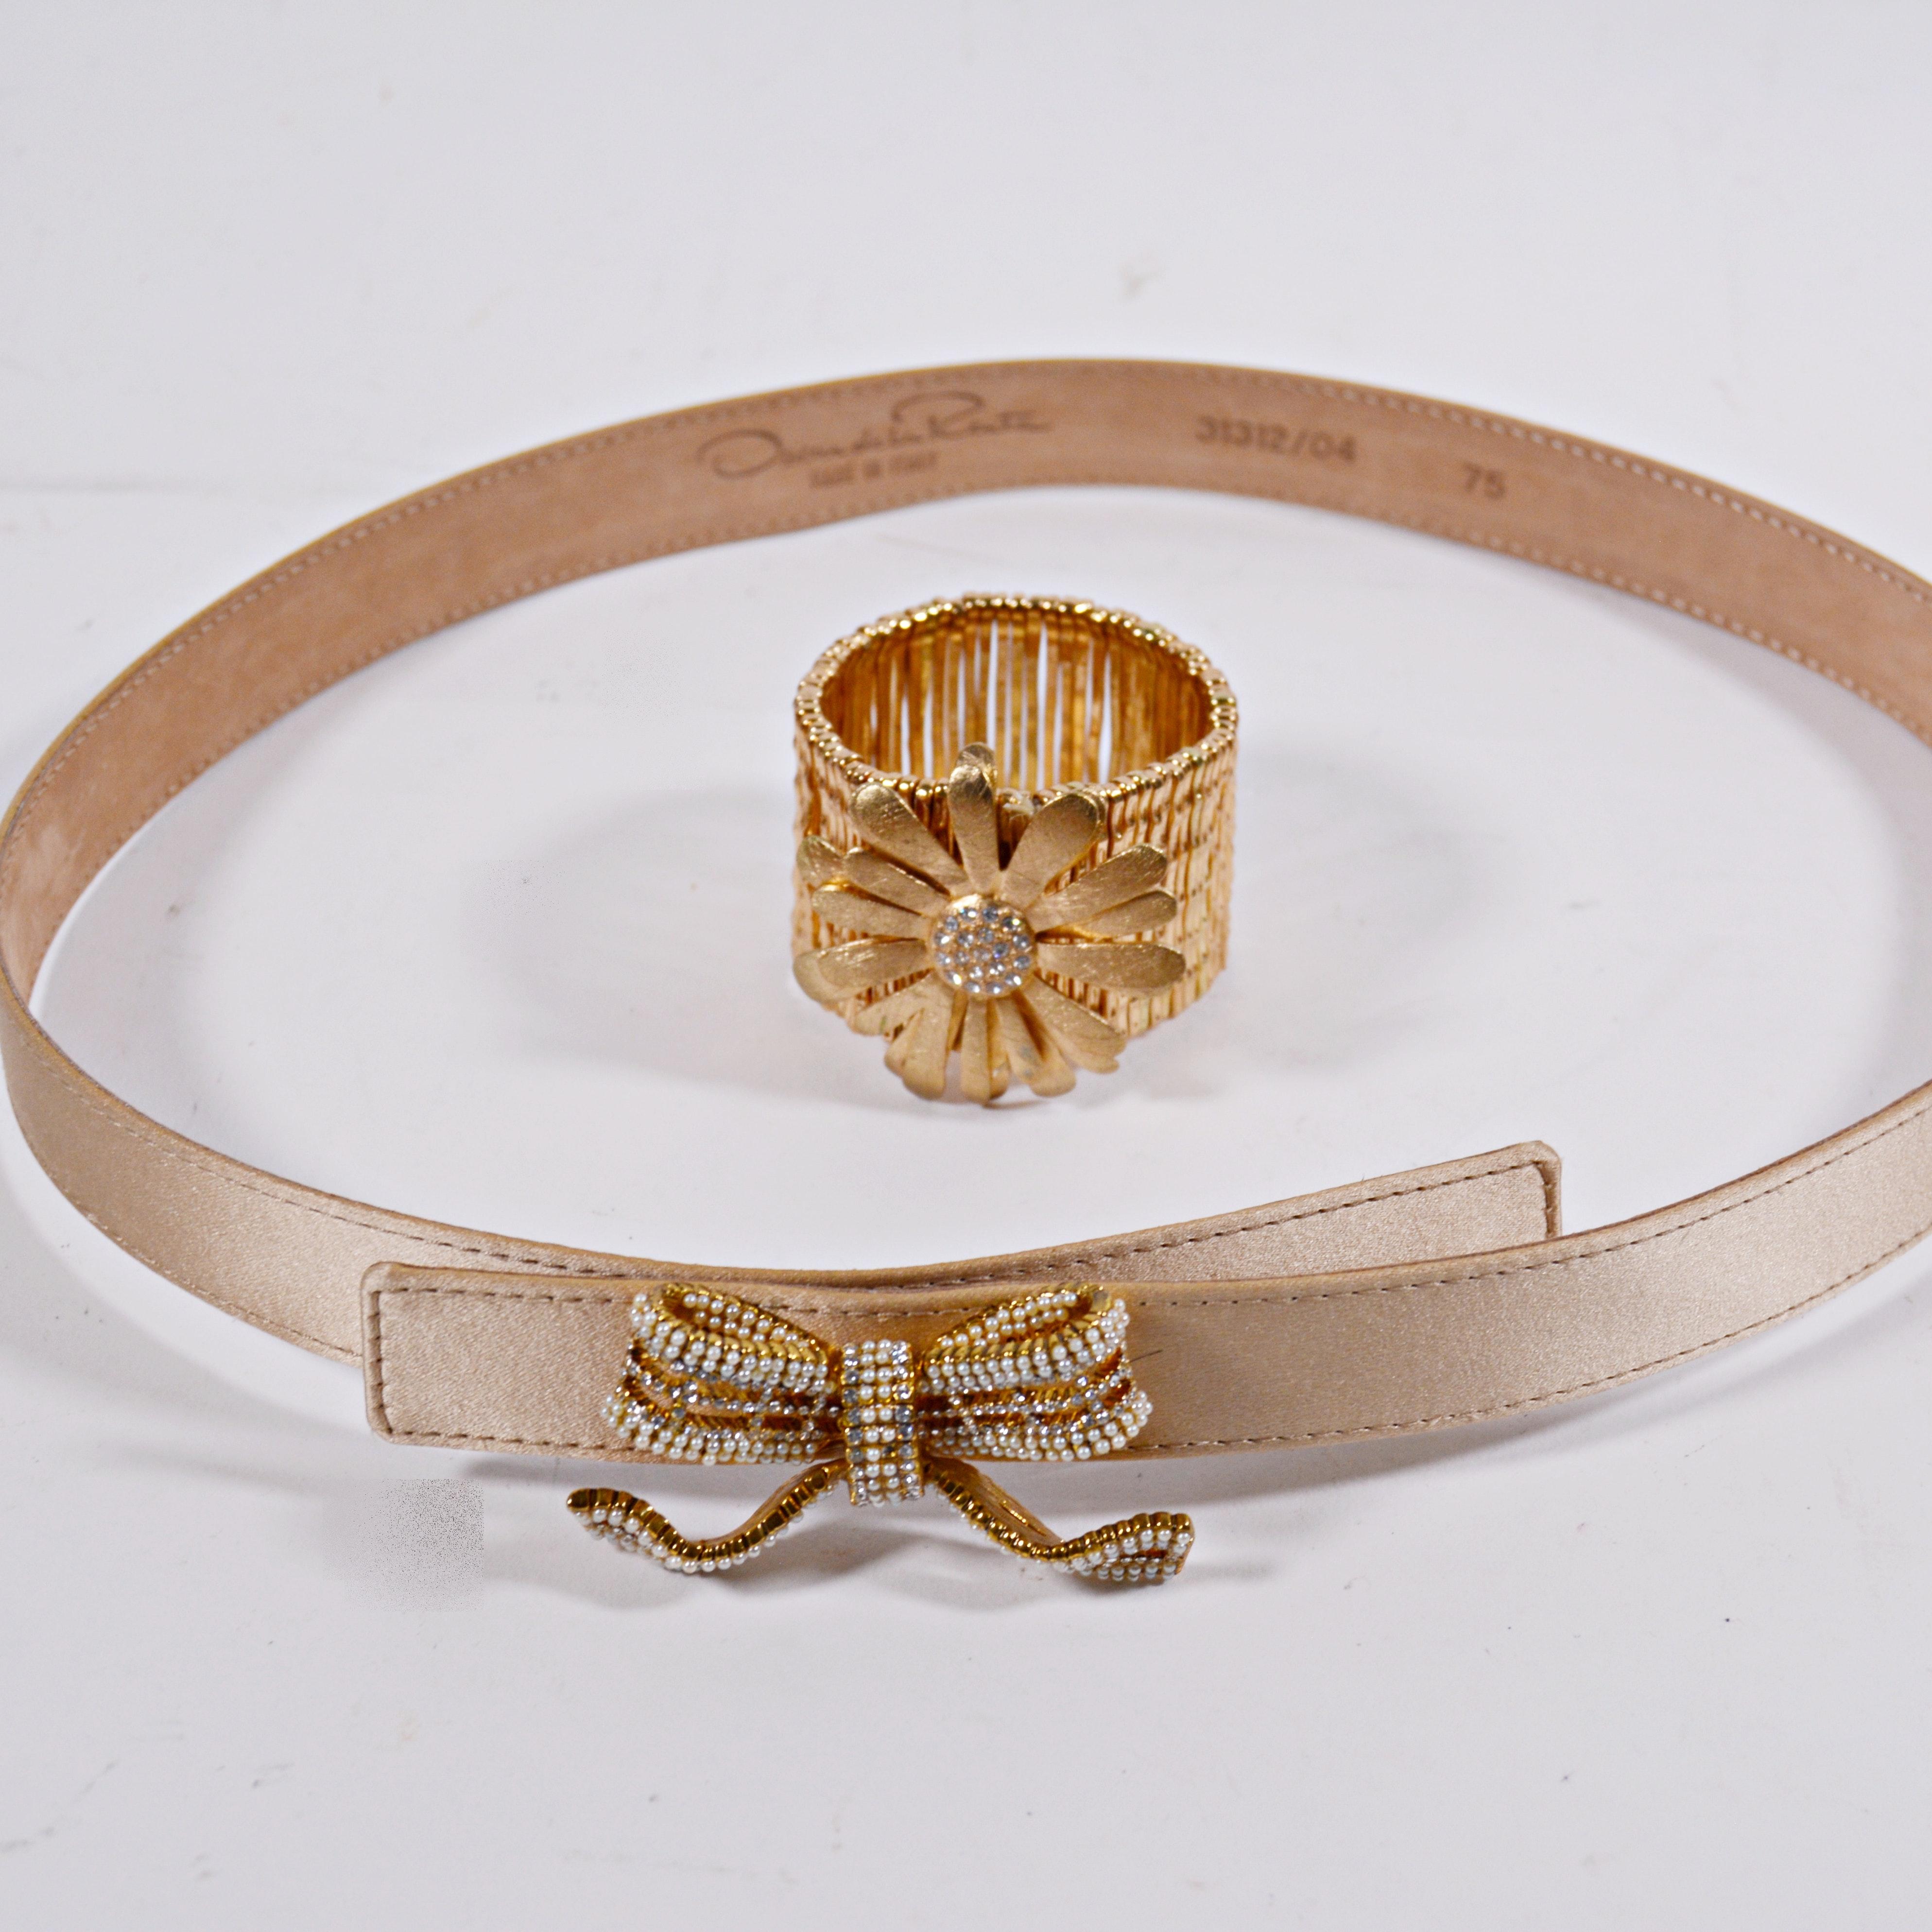 Oscar de la Renta Leather Belt and Gold Tone Crystal Bracelet